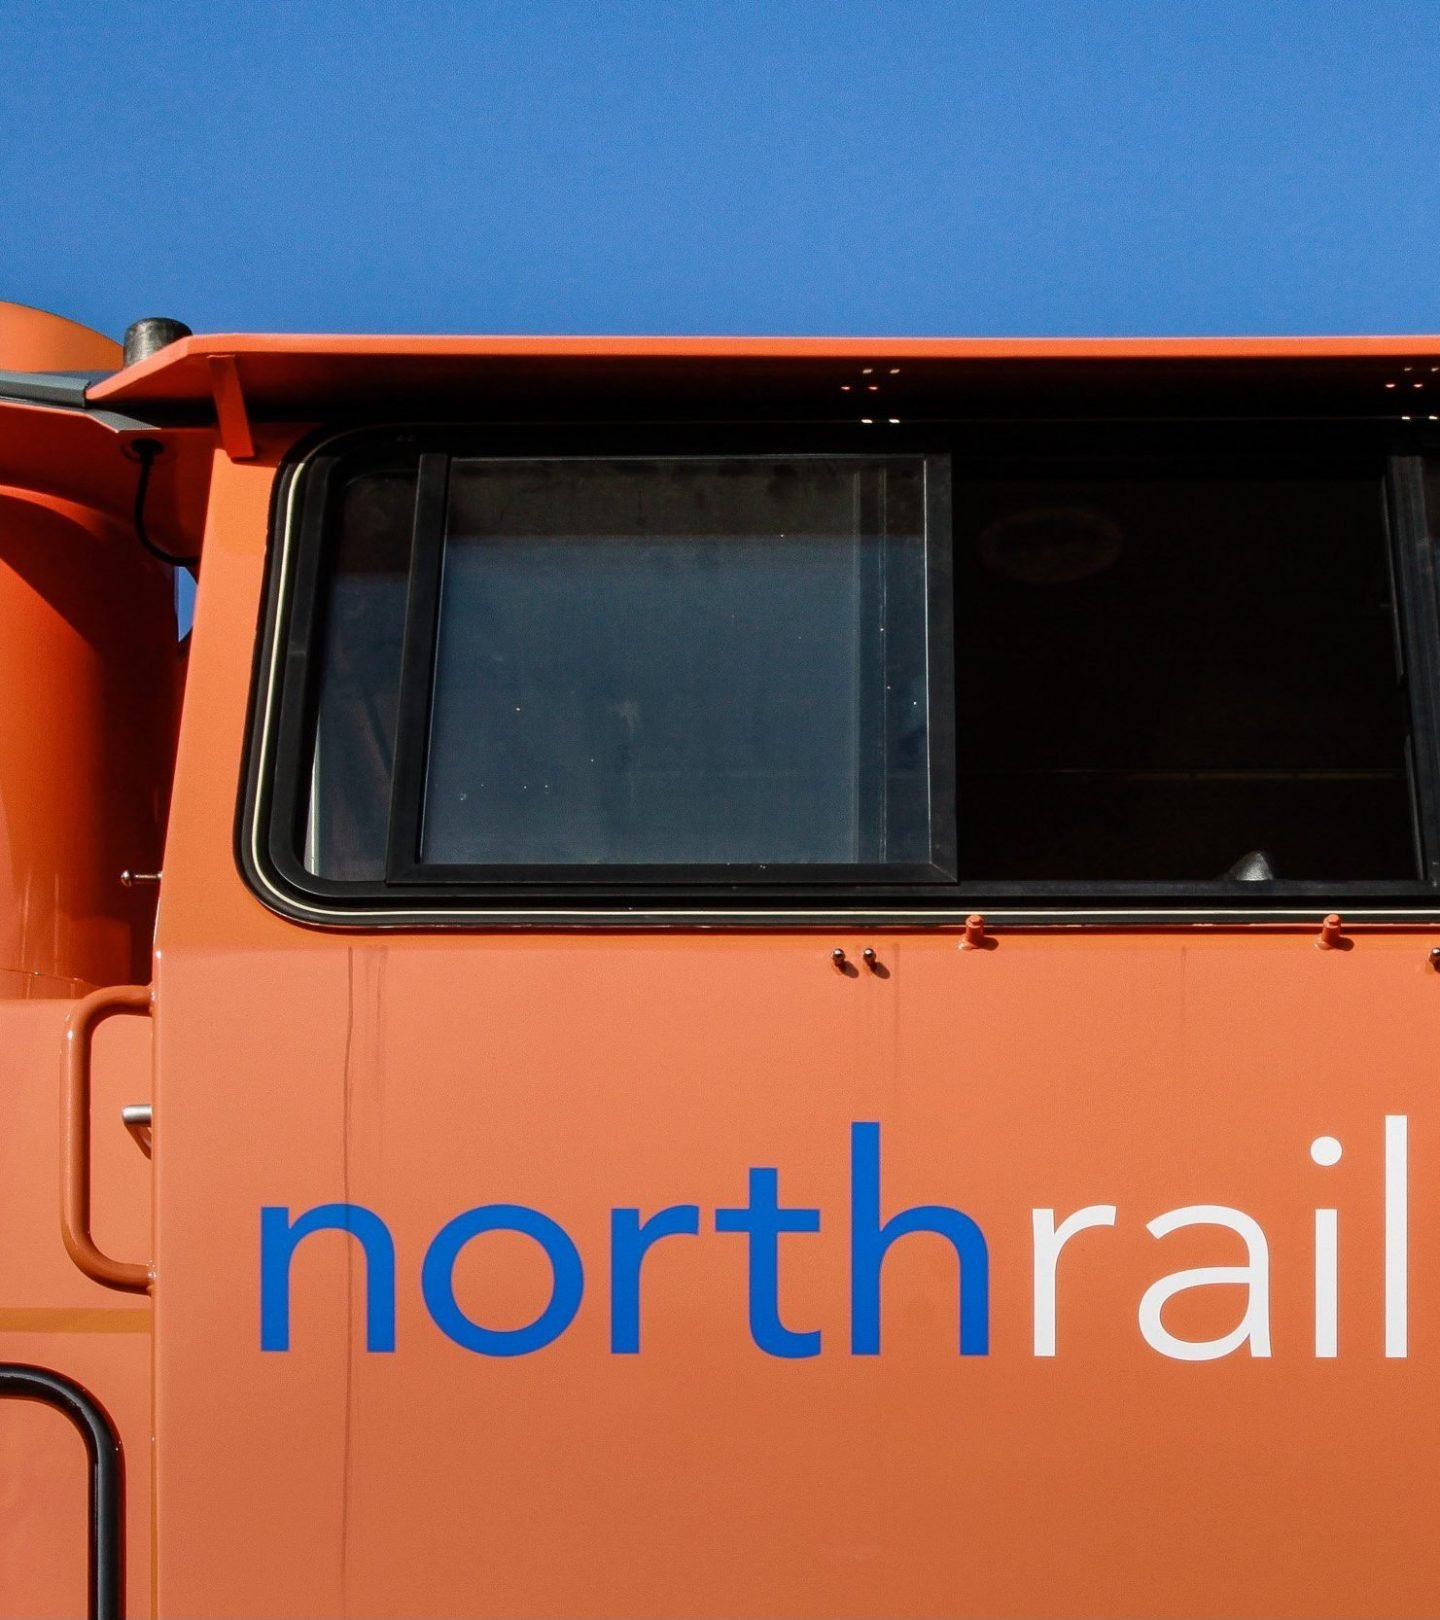 Paribus Rail Portfolio I - Fahrerhaus einer northrail-Lokomotive